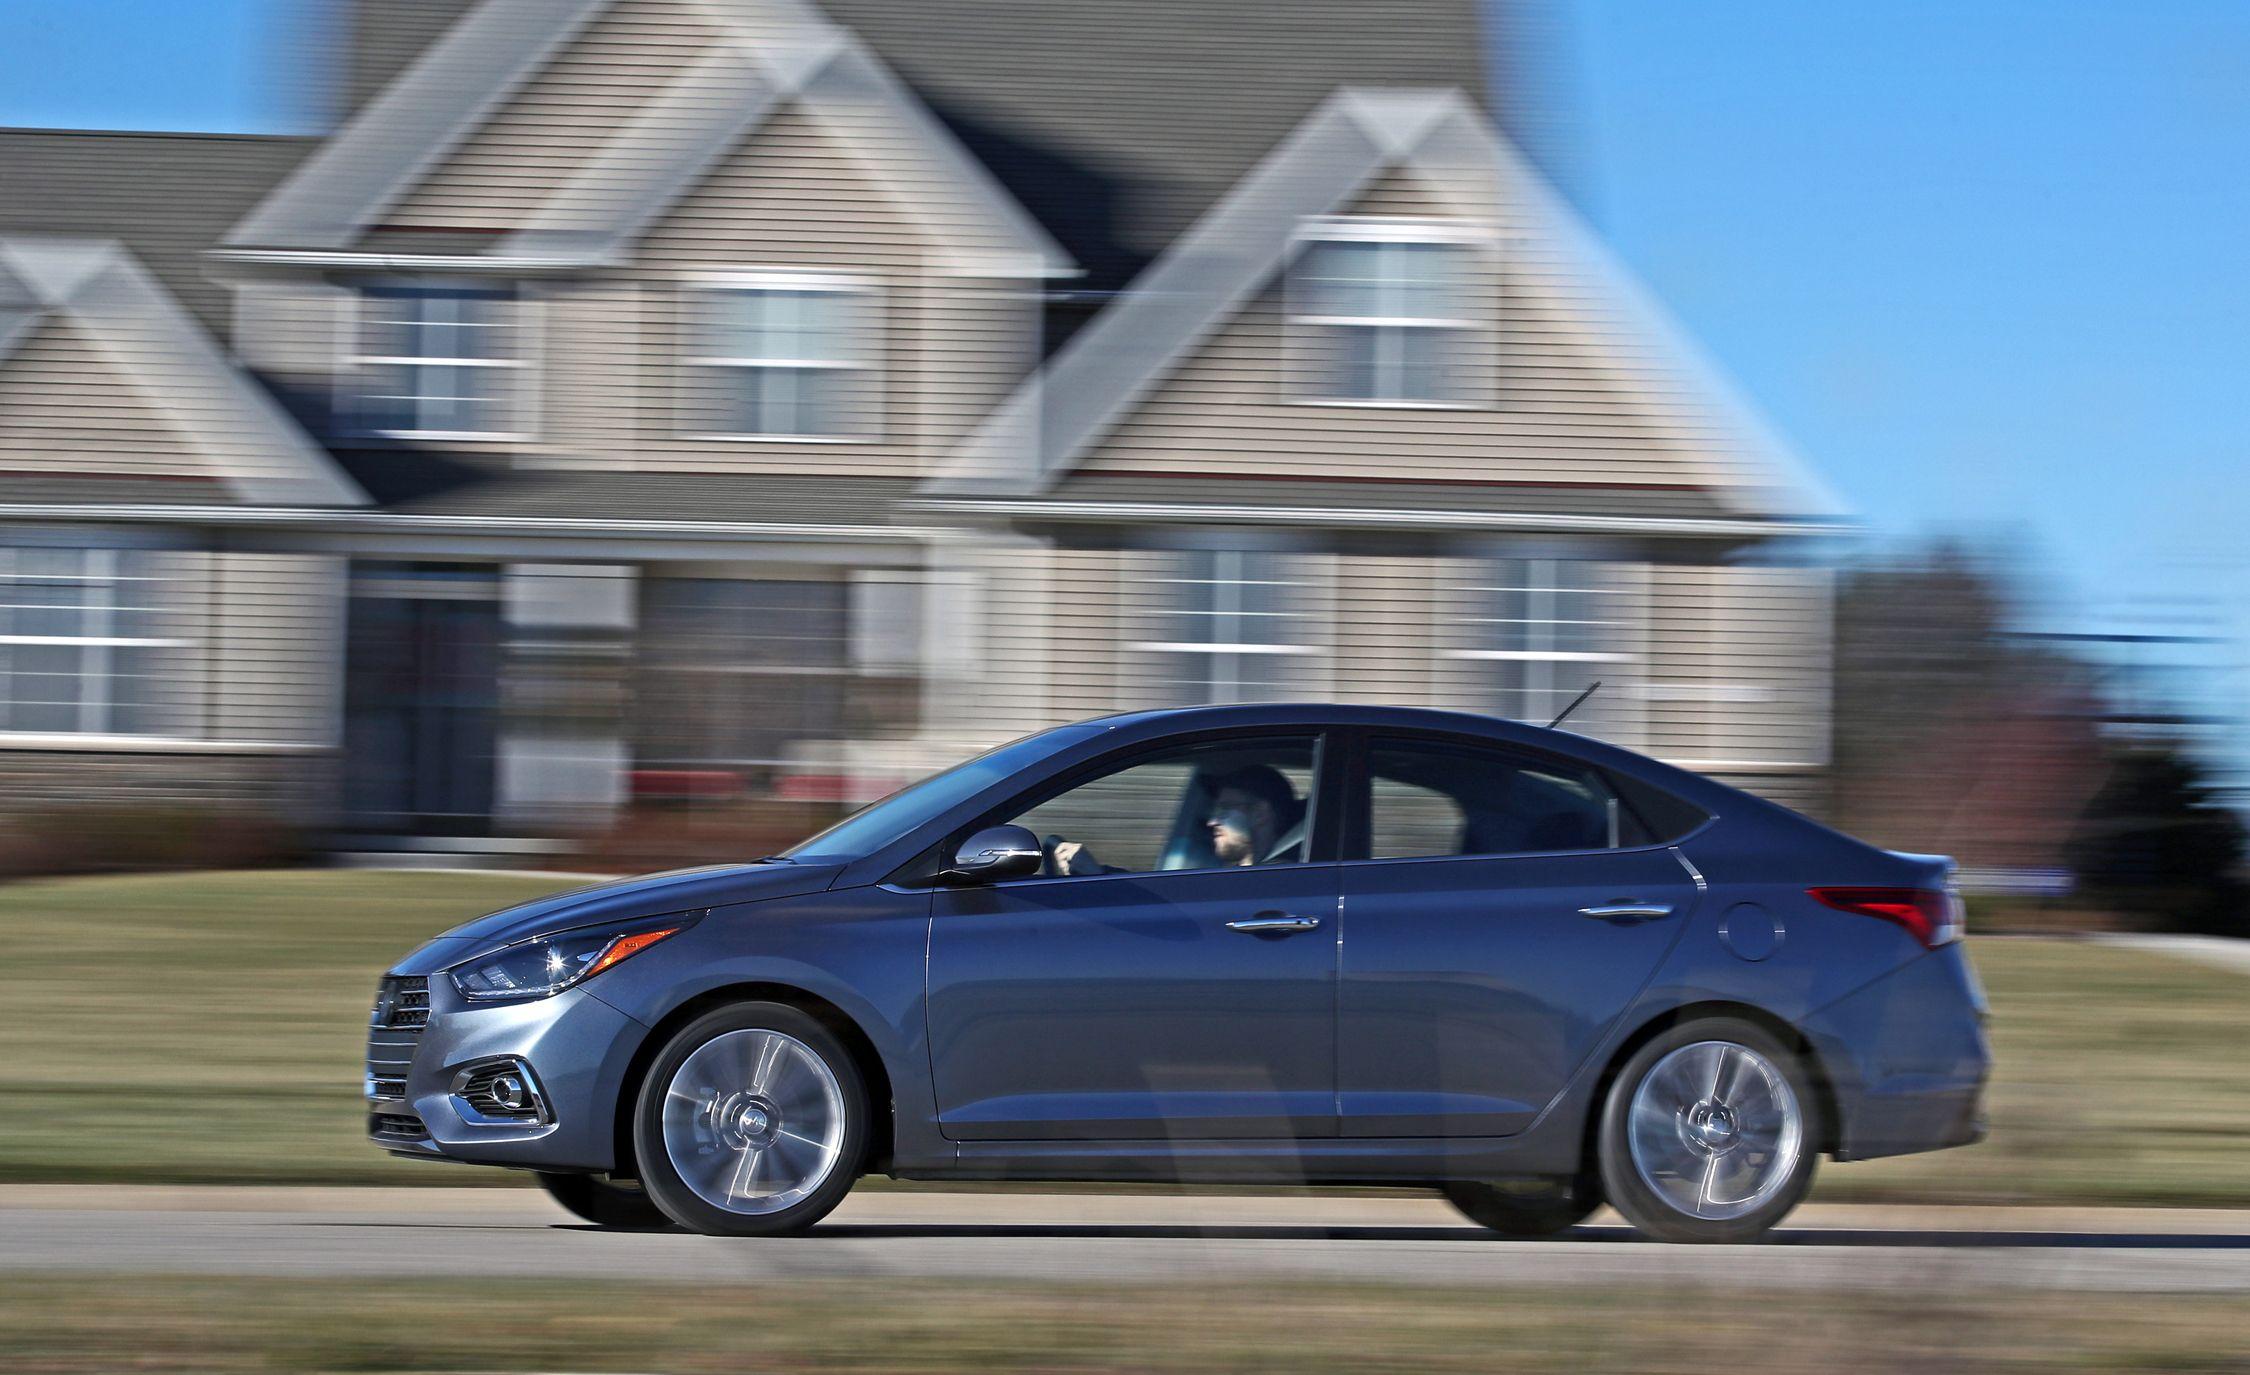 2018 Hyundai Accent Fuel Economy Review